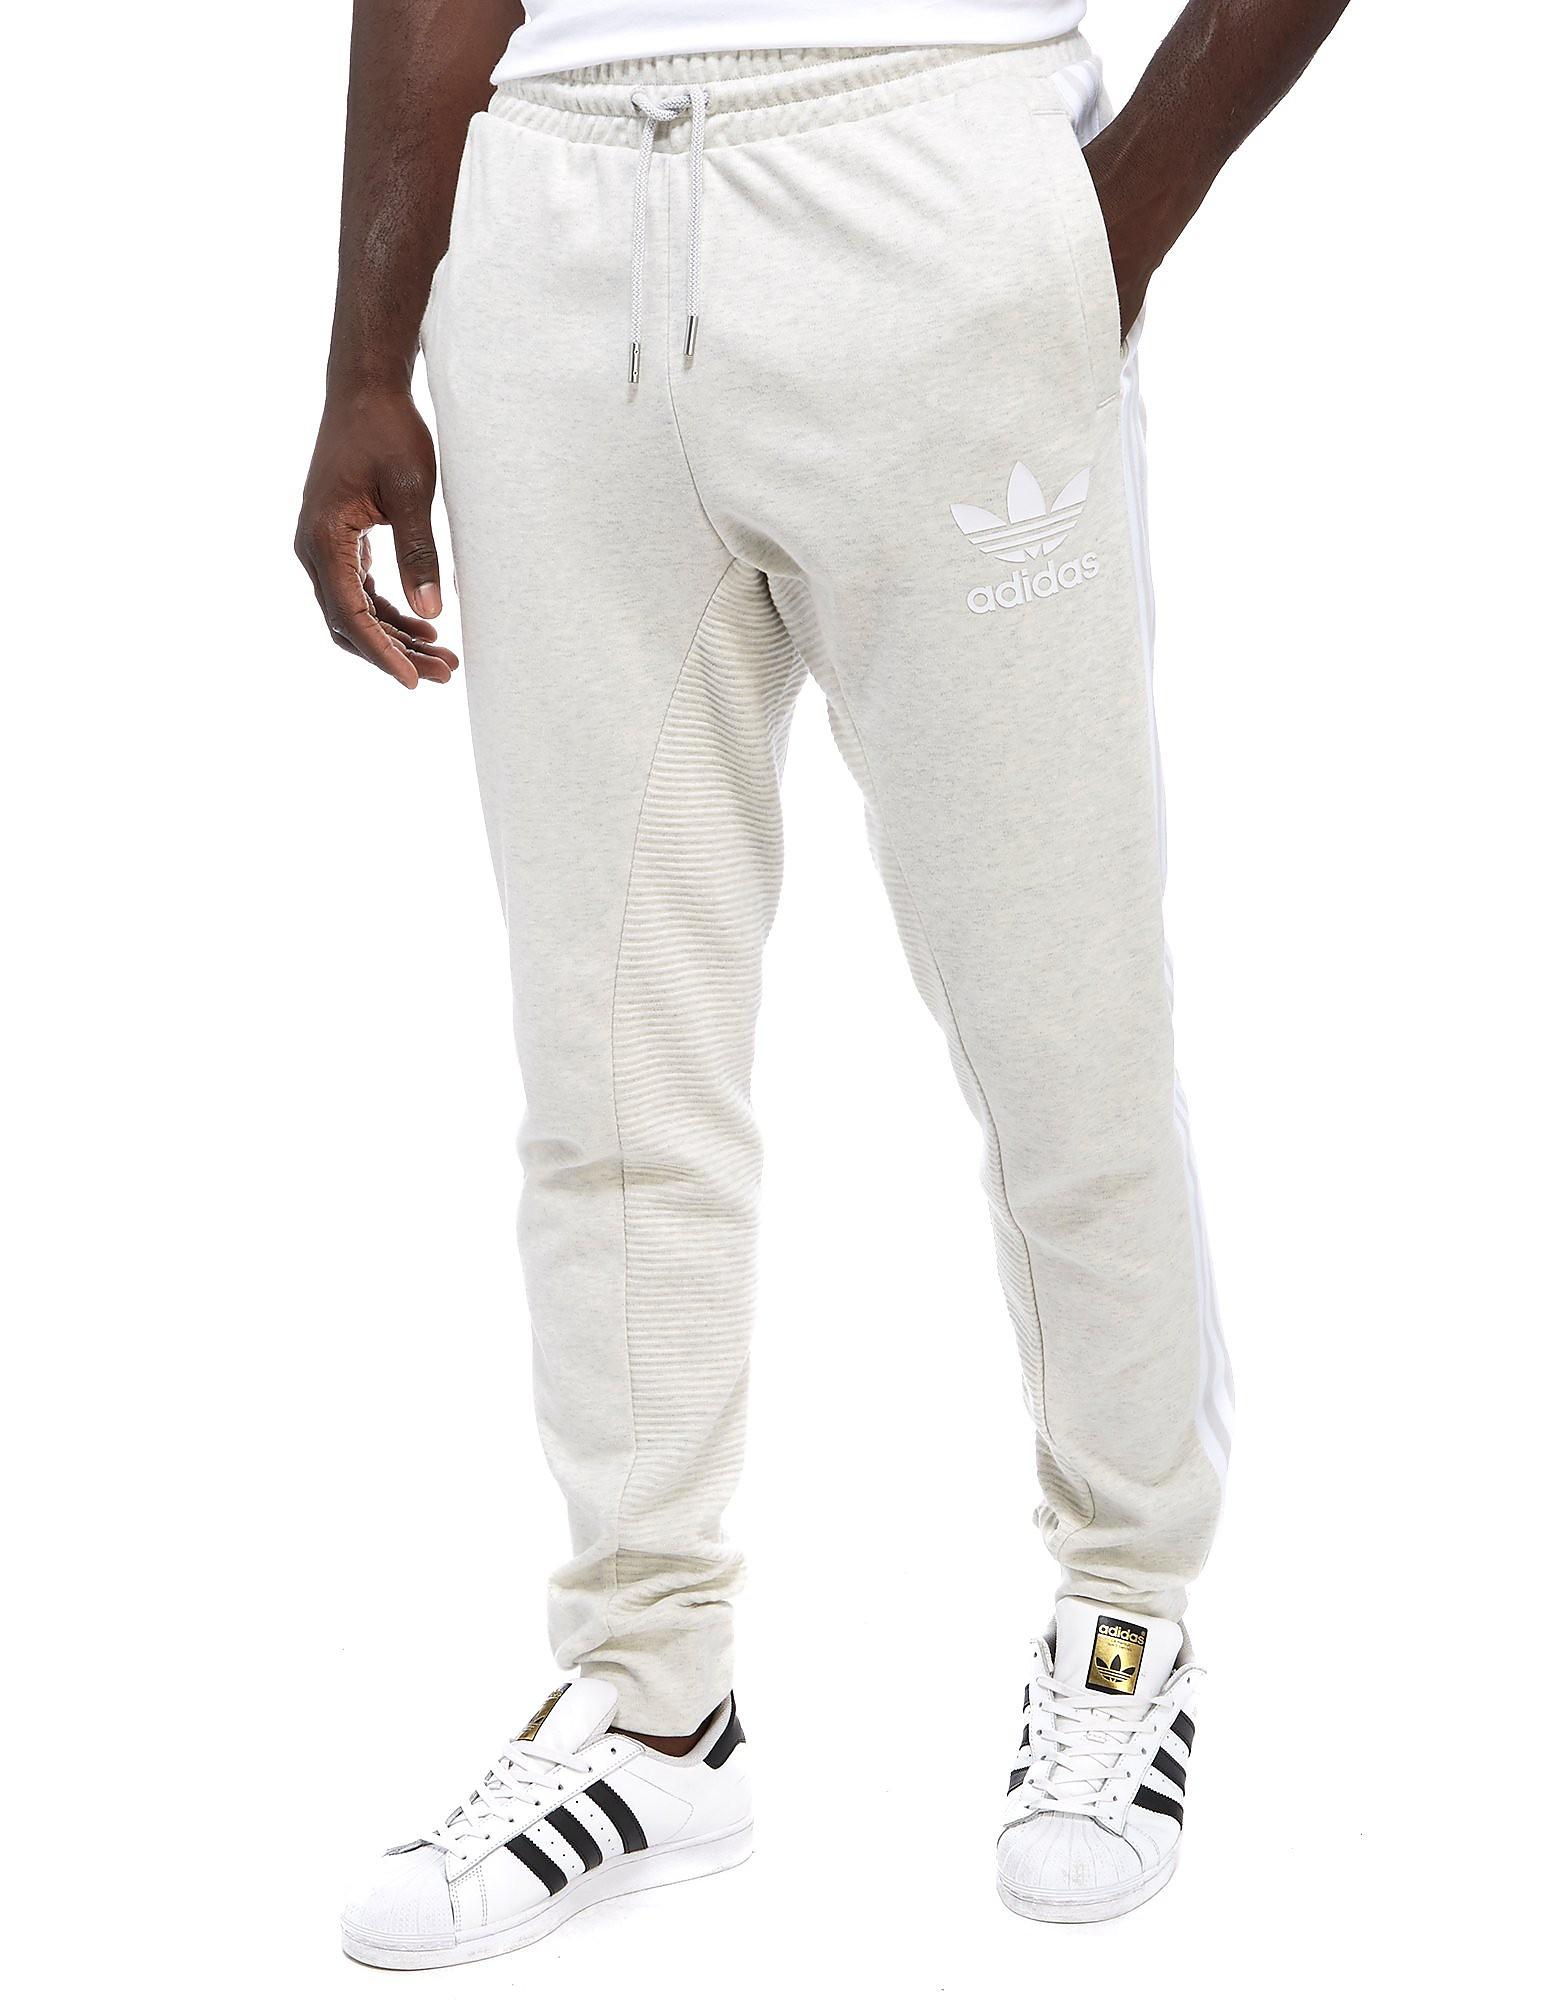 adidas Originals Curated Sweat Pants